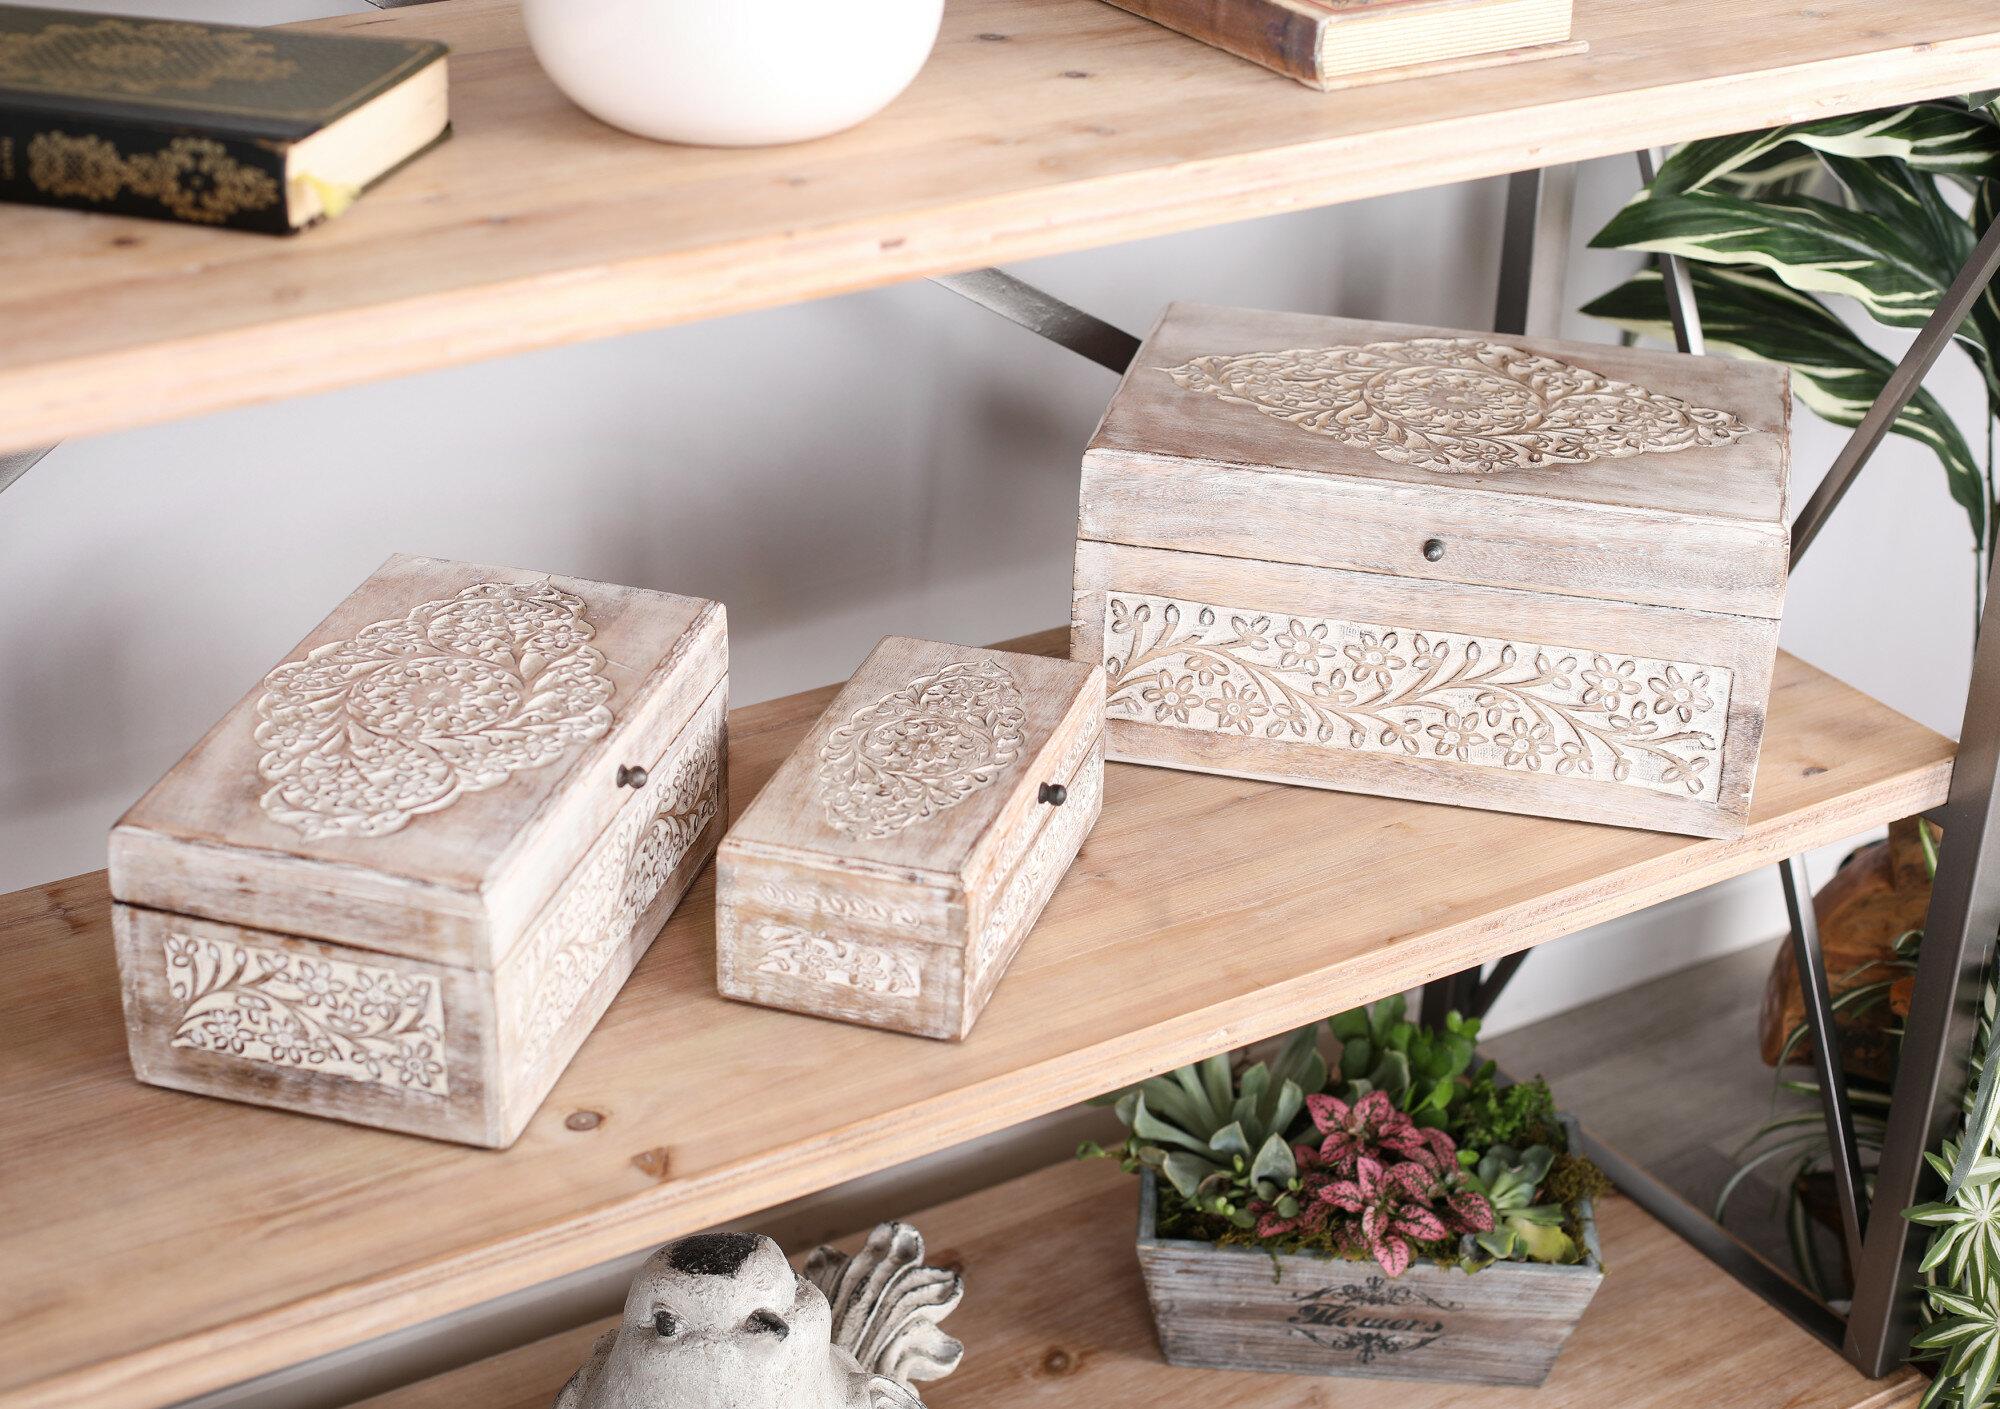 Set 10 Solid Midnight Black Nesting Decorative Shelf Storage Gift Boxes